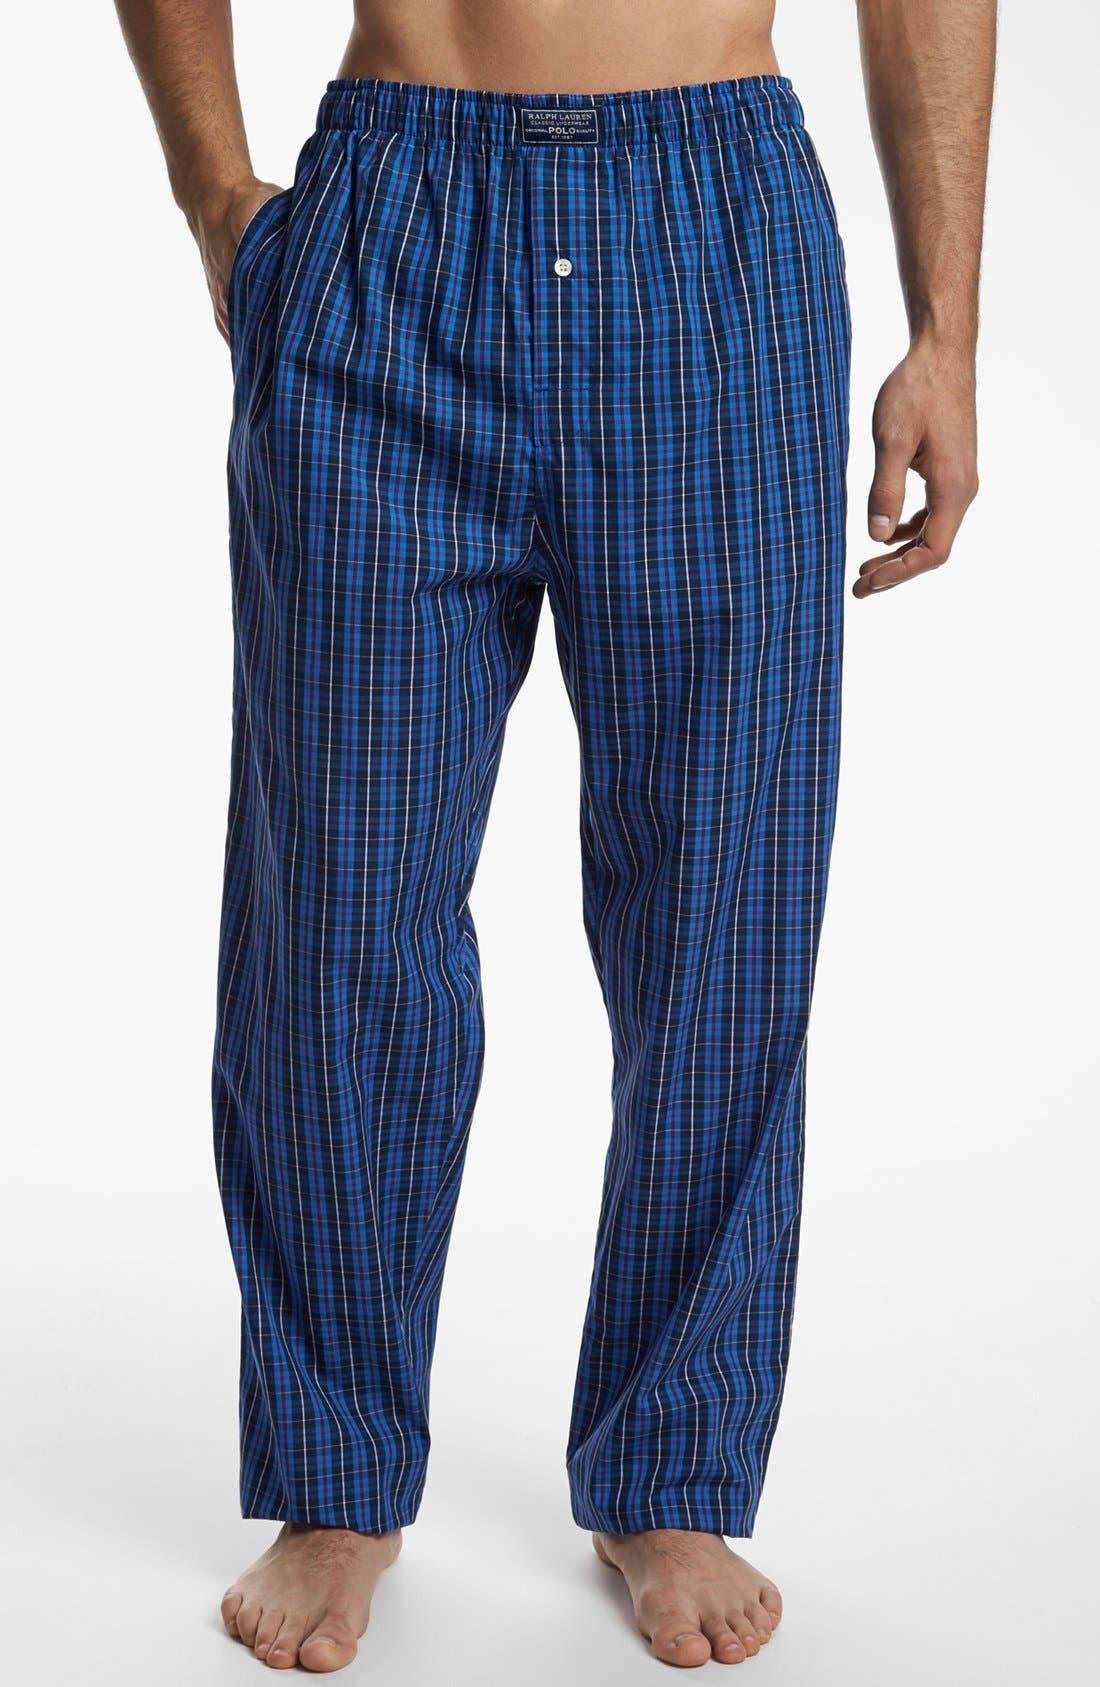 Alternate Image 1 Selected - Polo Ralph Lauren Woven Pajama Pants